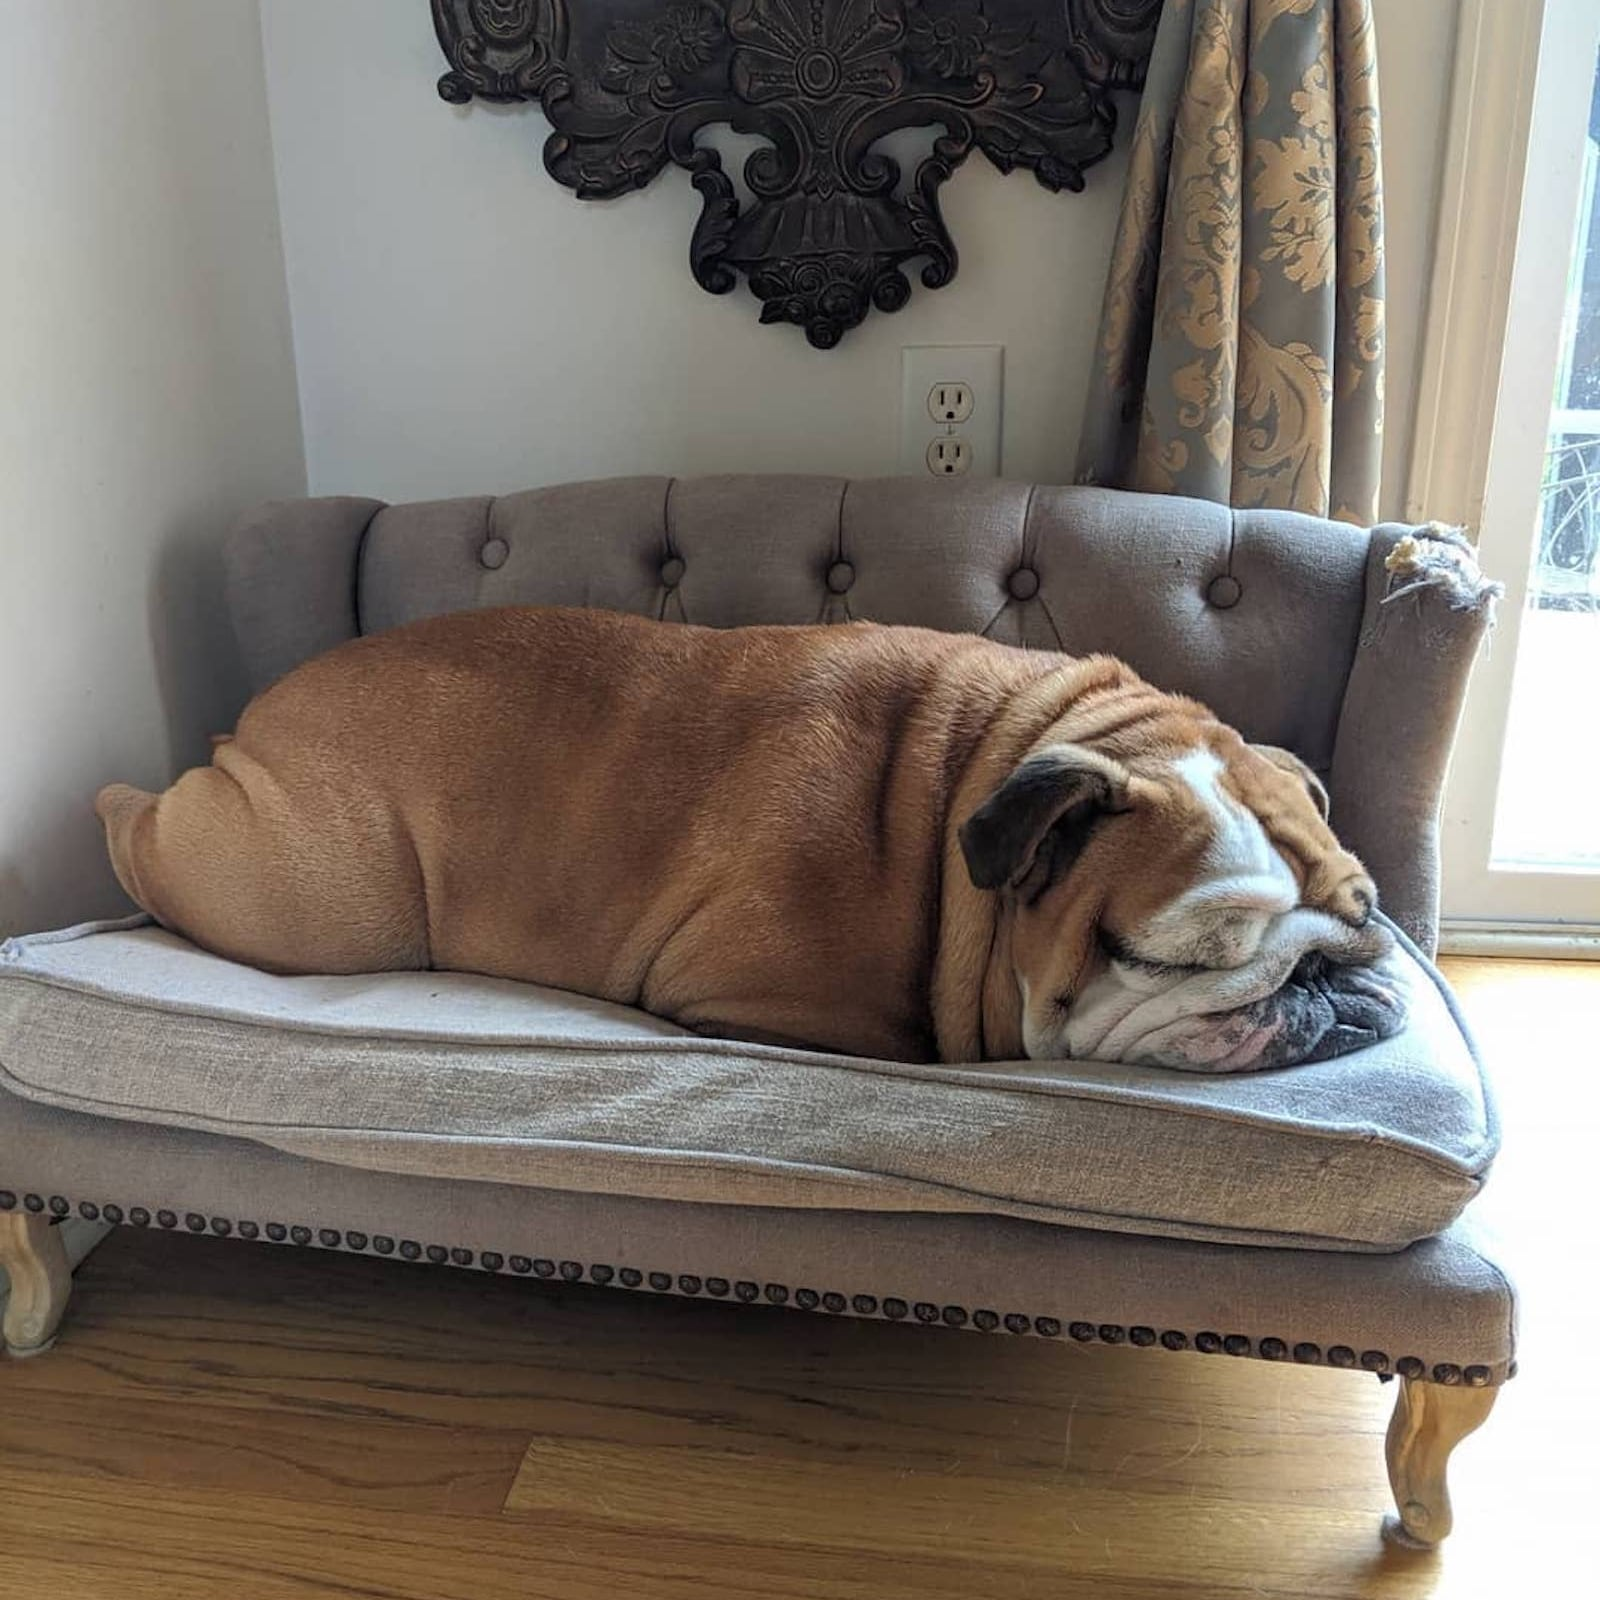 Pictures of Winston the Bulldog Sleeping   POPSUGAR Pets